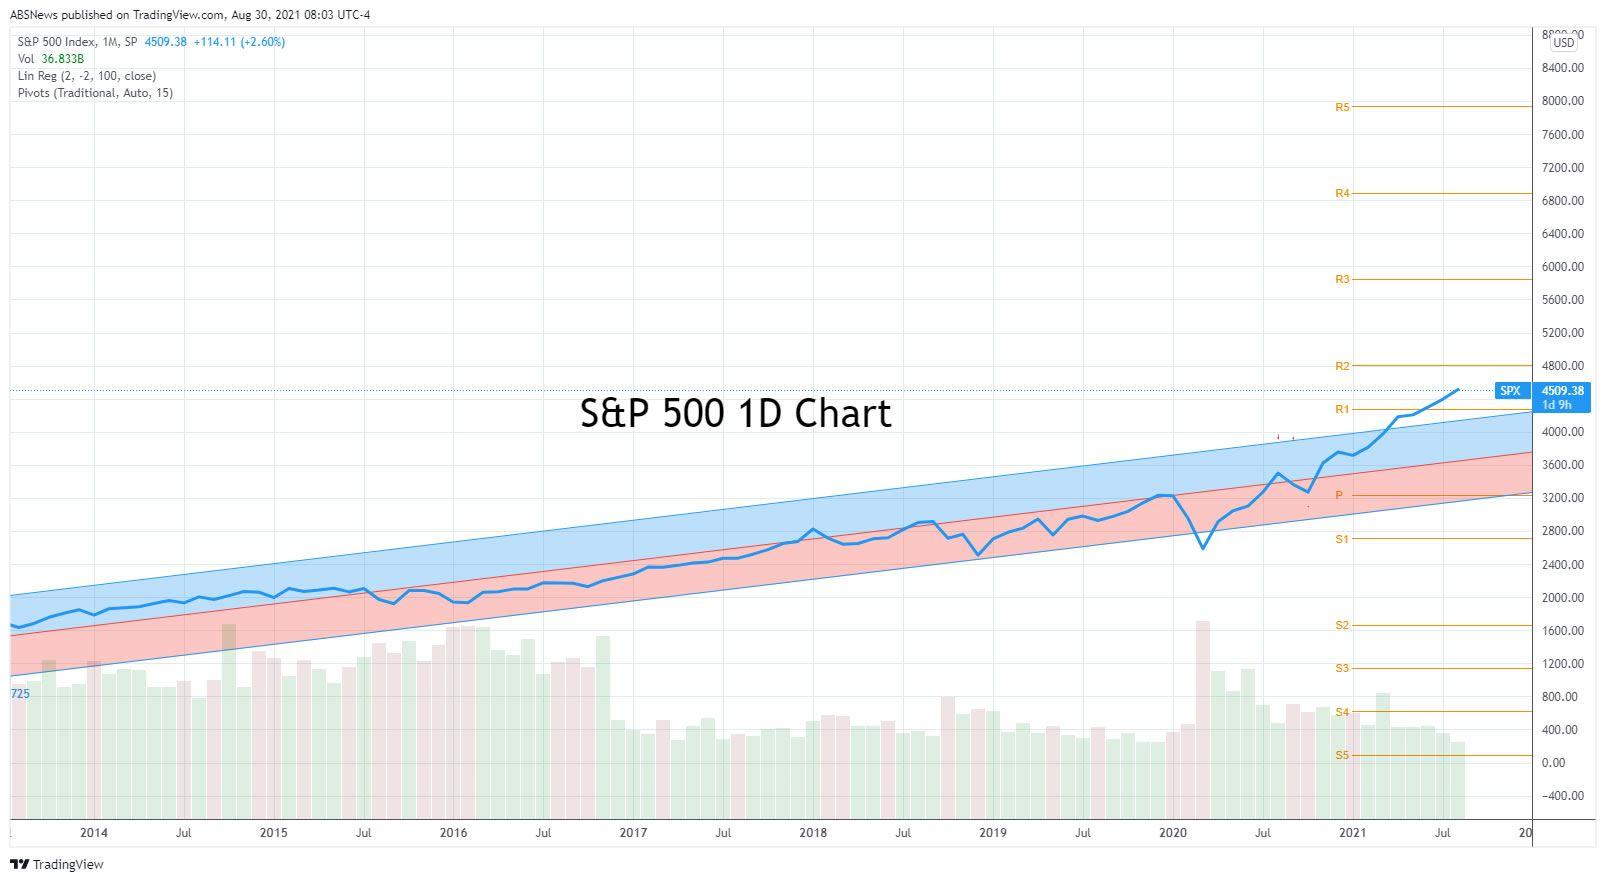 S&P 500 8-30-21